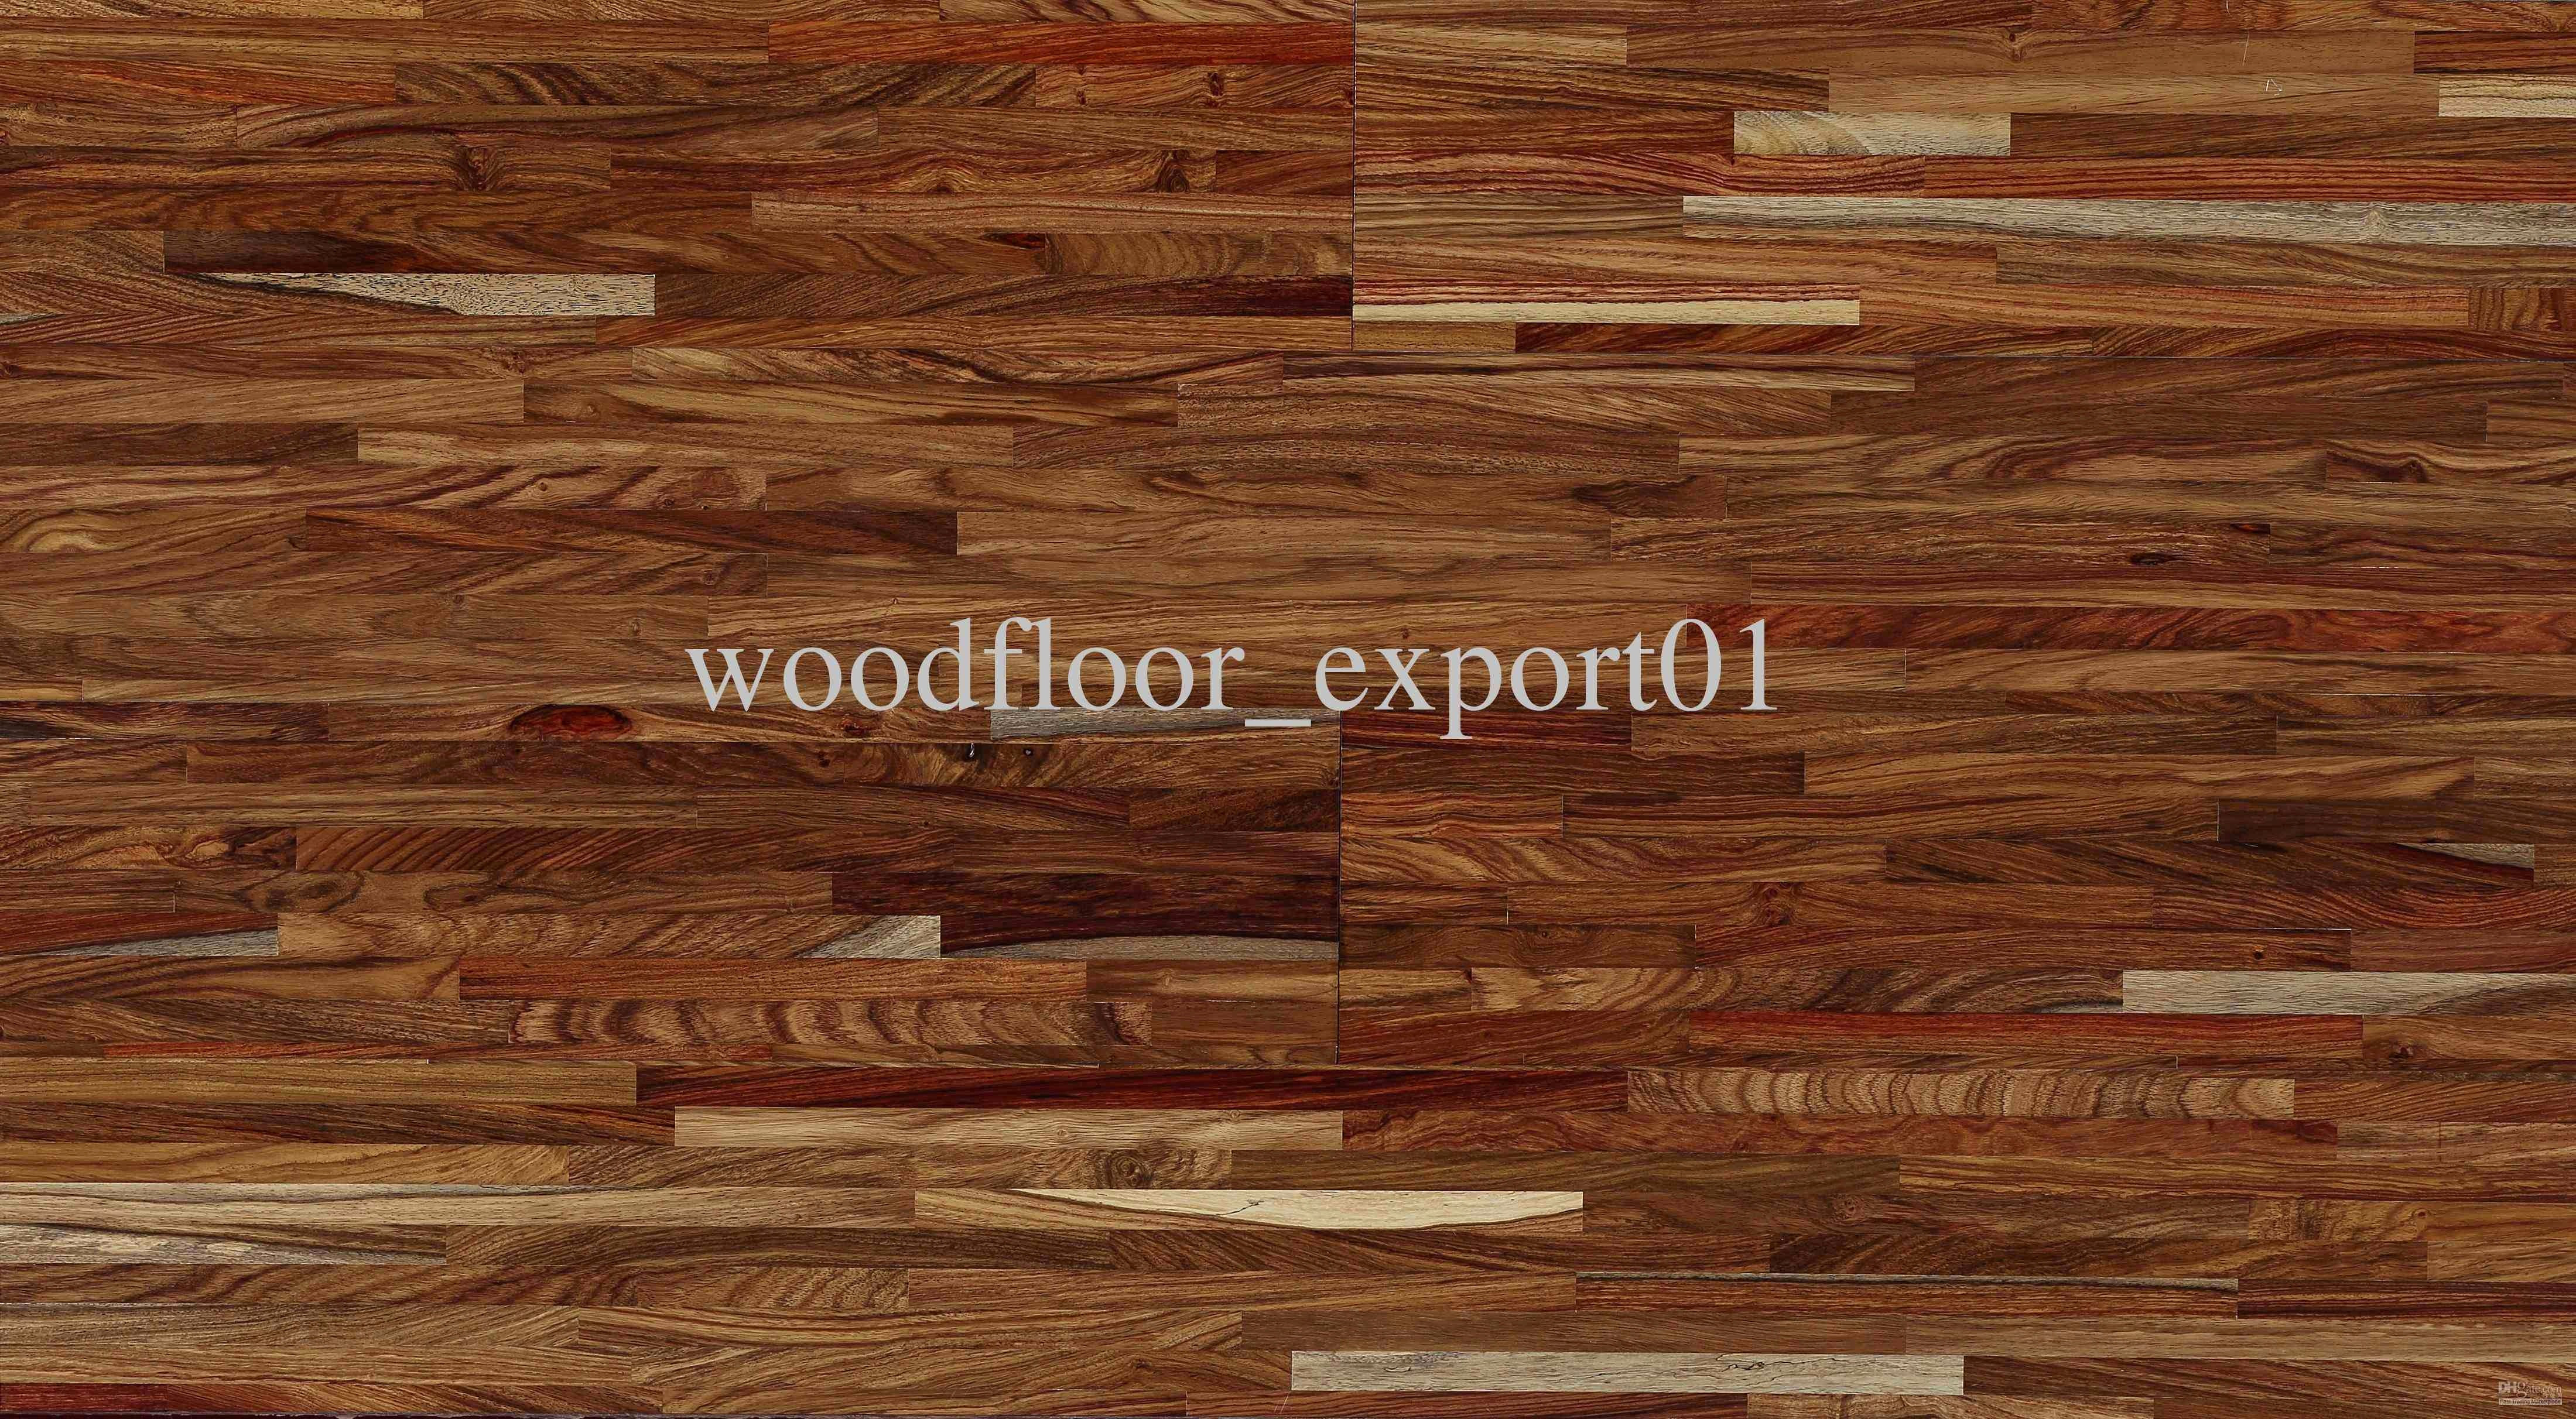 how to make hardwood floors of 19 luxury hardwood refinishing stock dizpos com throughout hardwood refinishing awesome 50 new restaining hardwood floors 50 s photos of 19 luxury hardwood refinishing